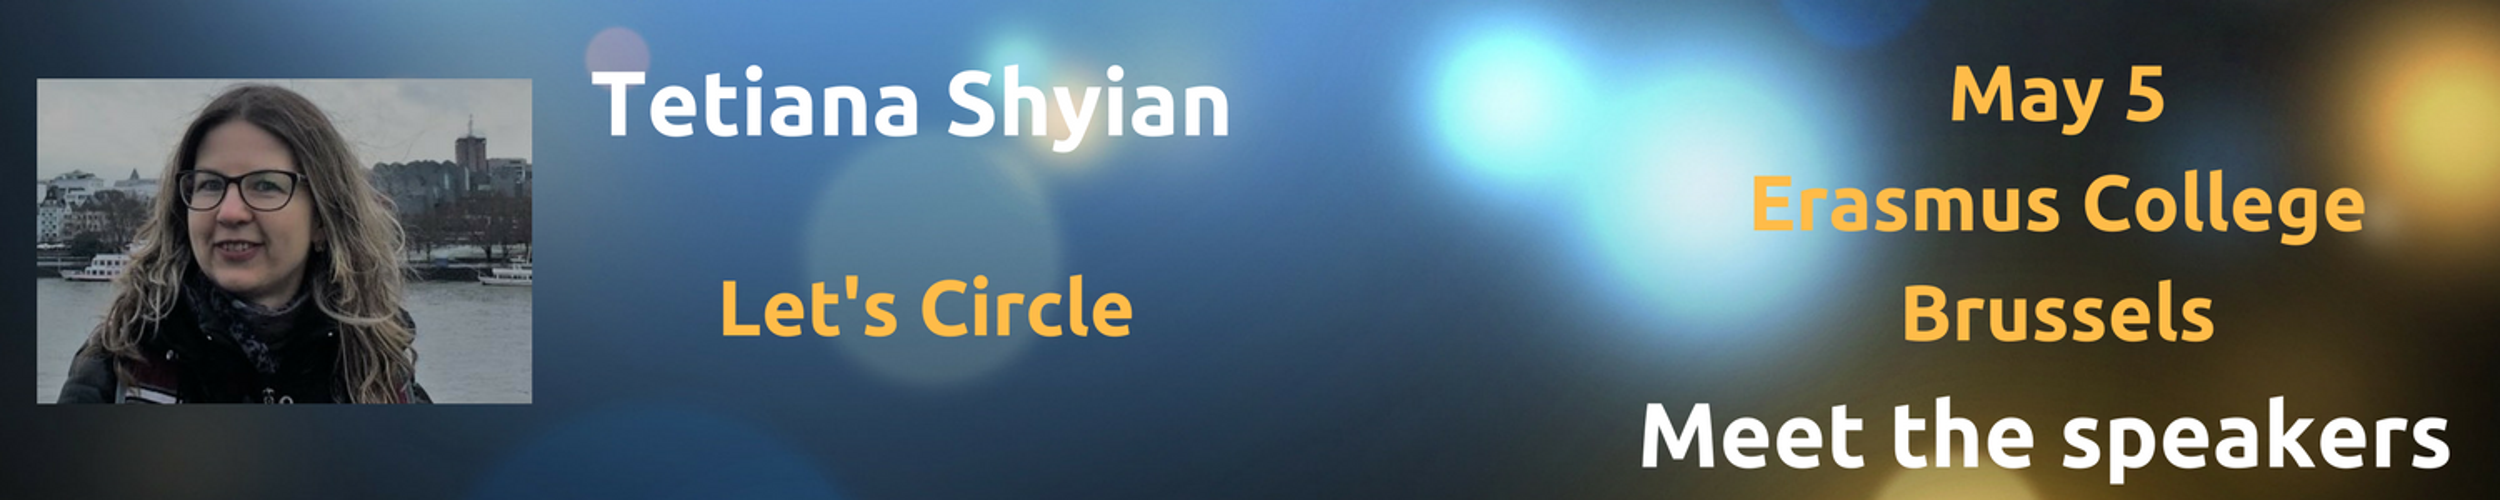 Meet The Speakers: Tetiana Shyian